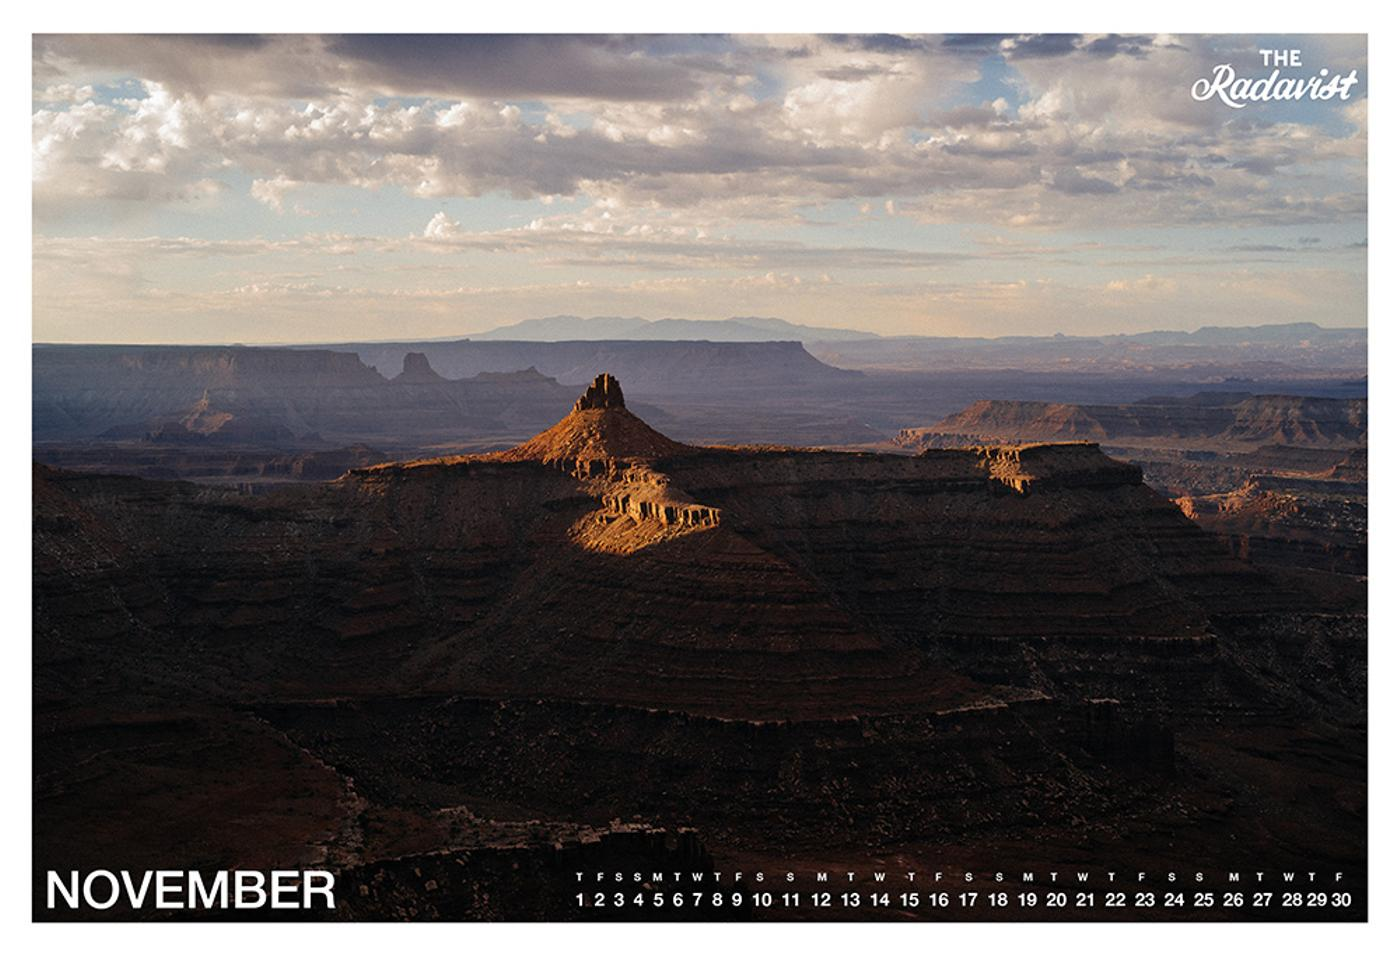 The Radavist 2018 Calendar: November